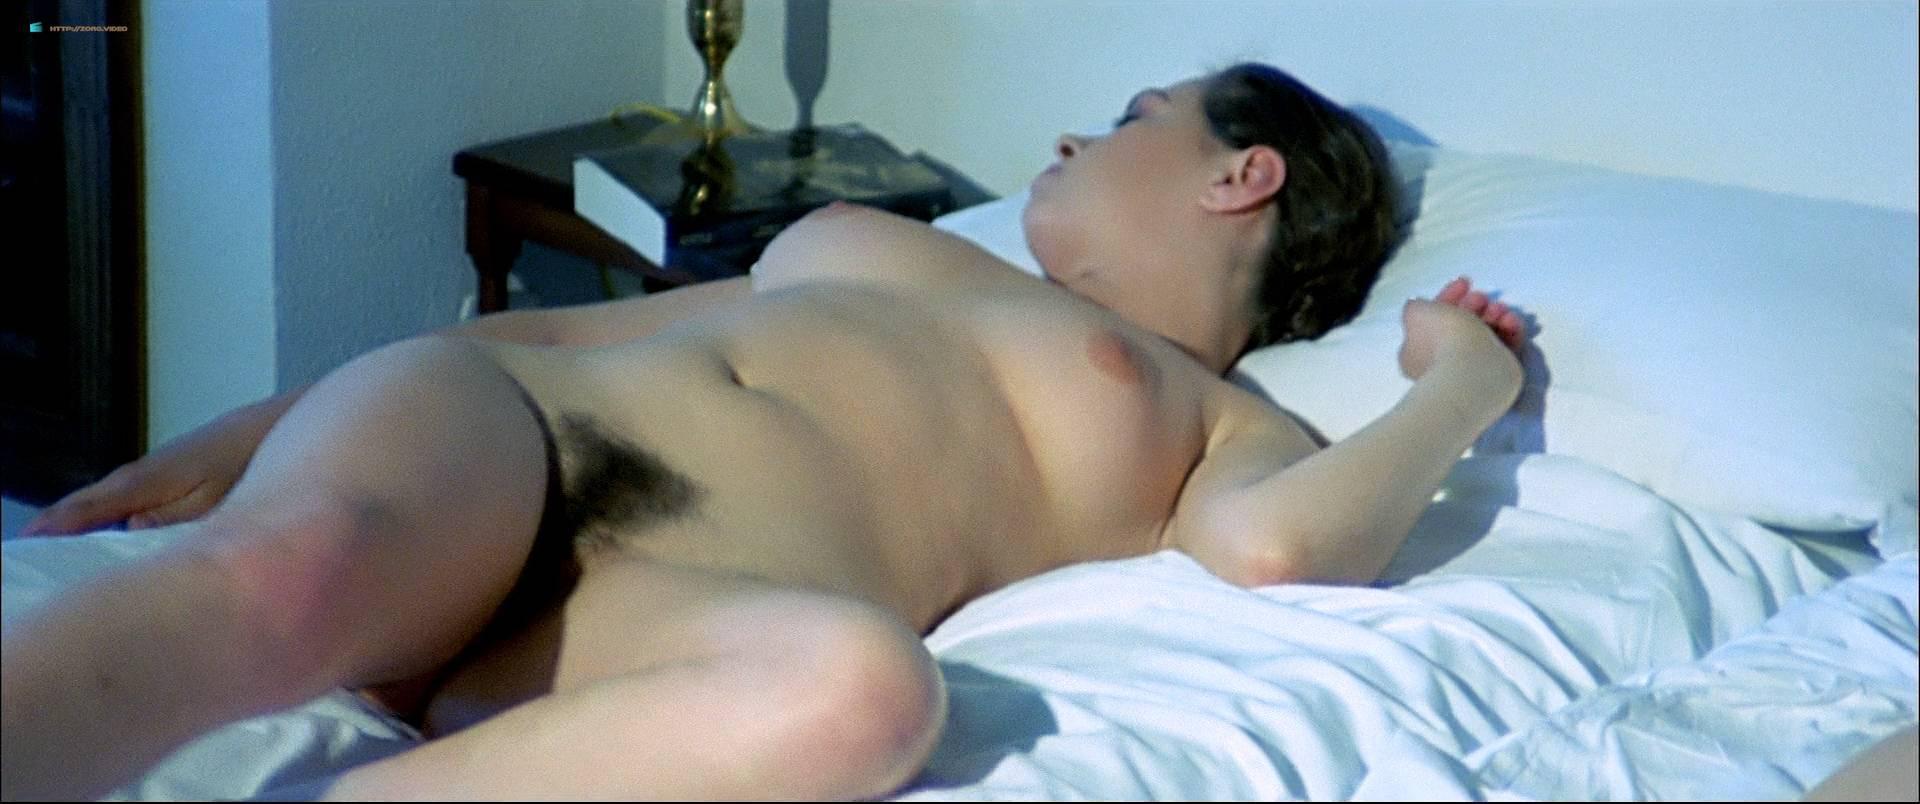 Lina Romay nude full frontal Mari Carmen Nieto, Alicia Príncipe nude too - Night of 1,000 Sexes (SP-1984) HD 1080p BluRay (11)